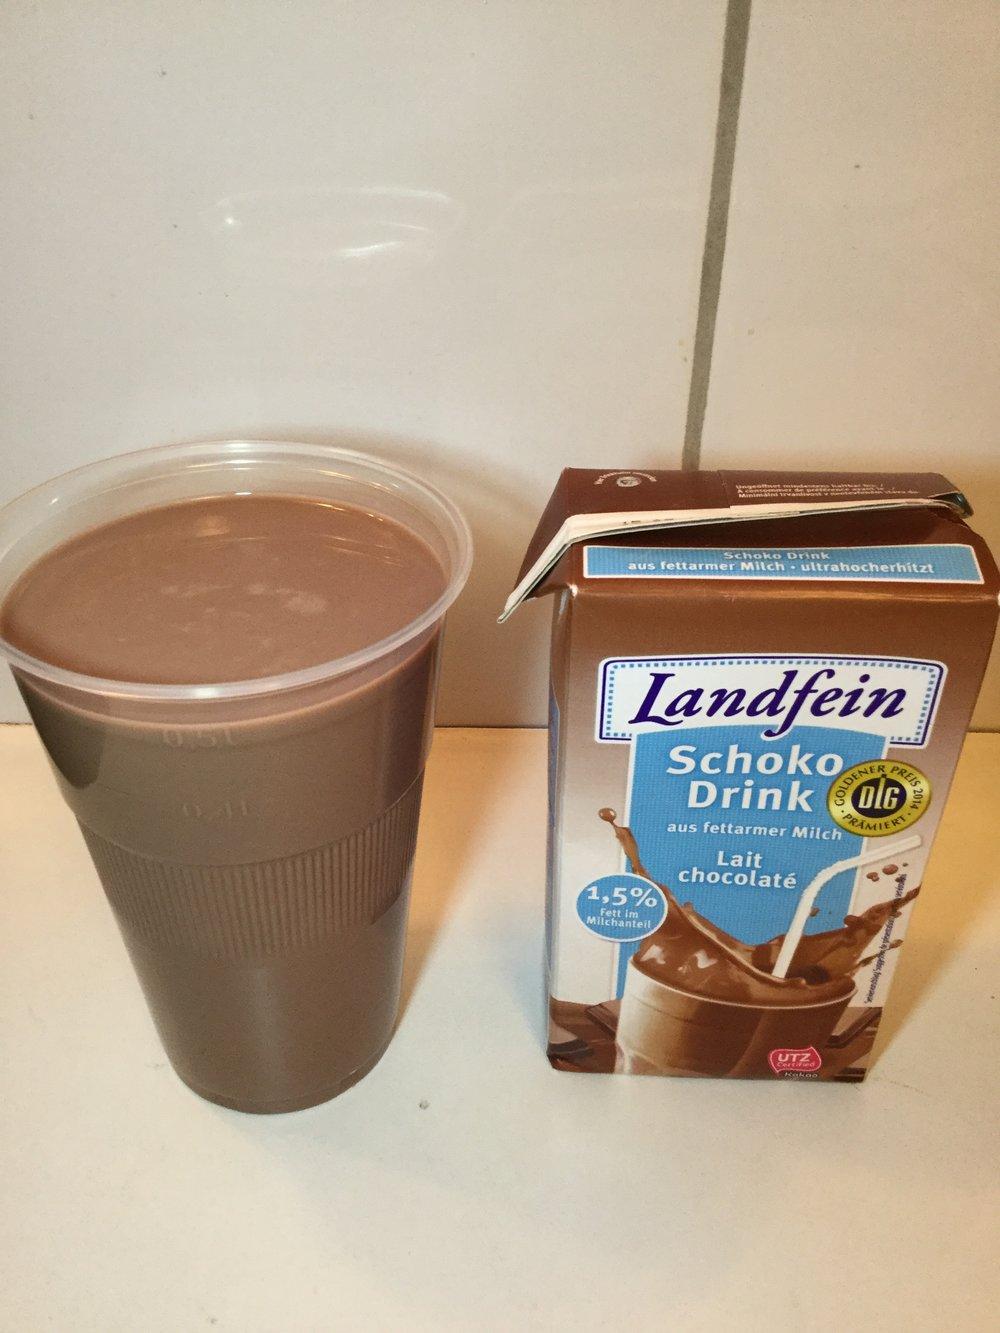 Landfein Schoko Drink (Low Fat) Cup